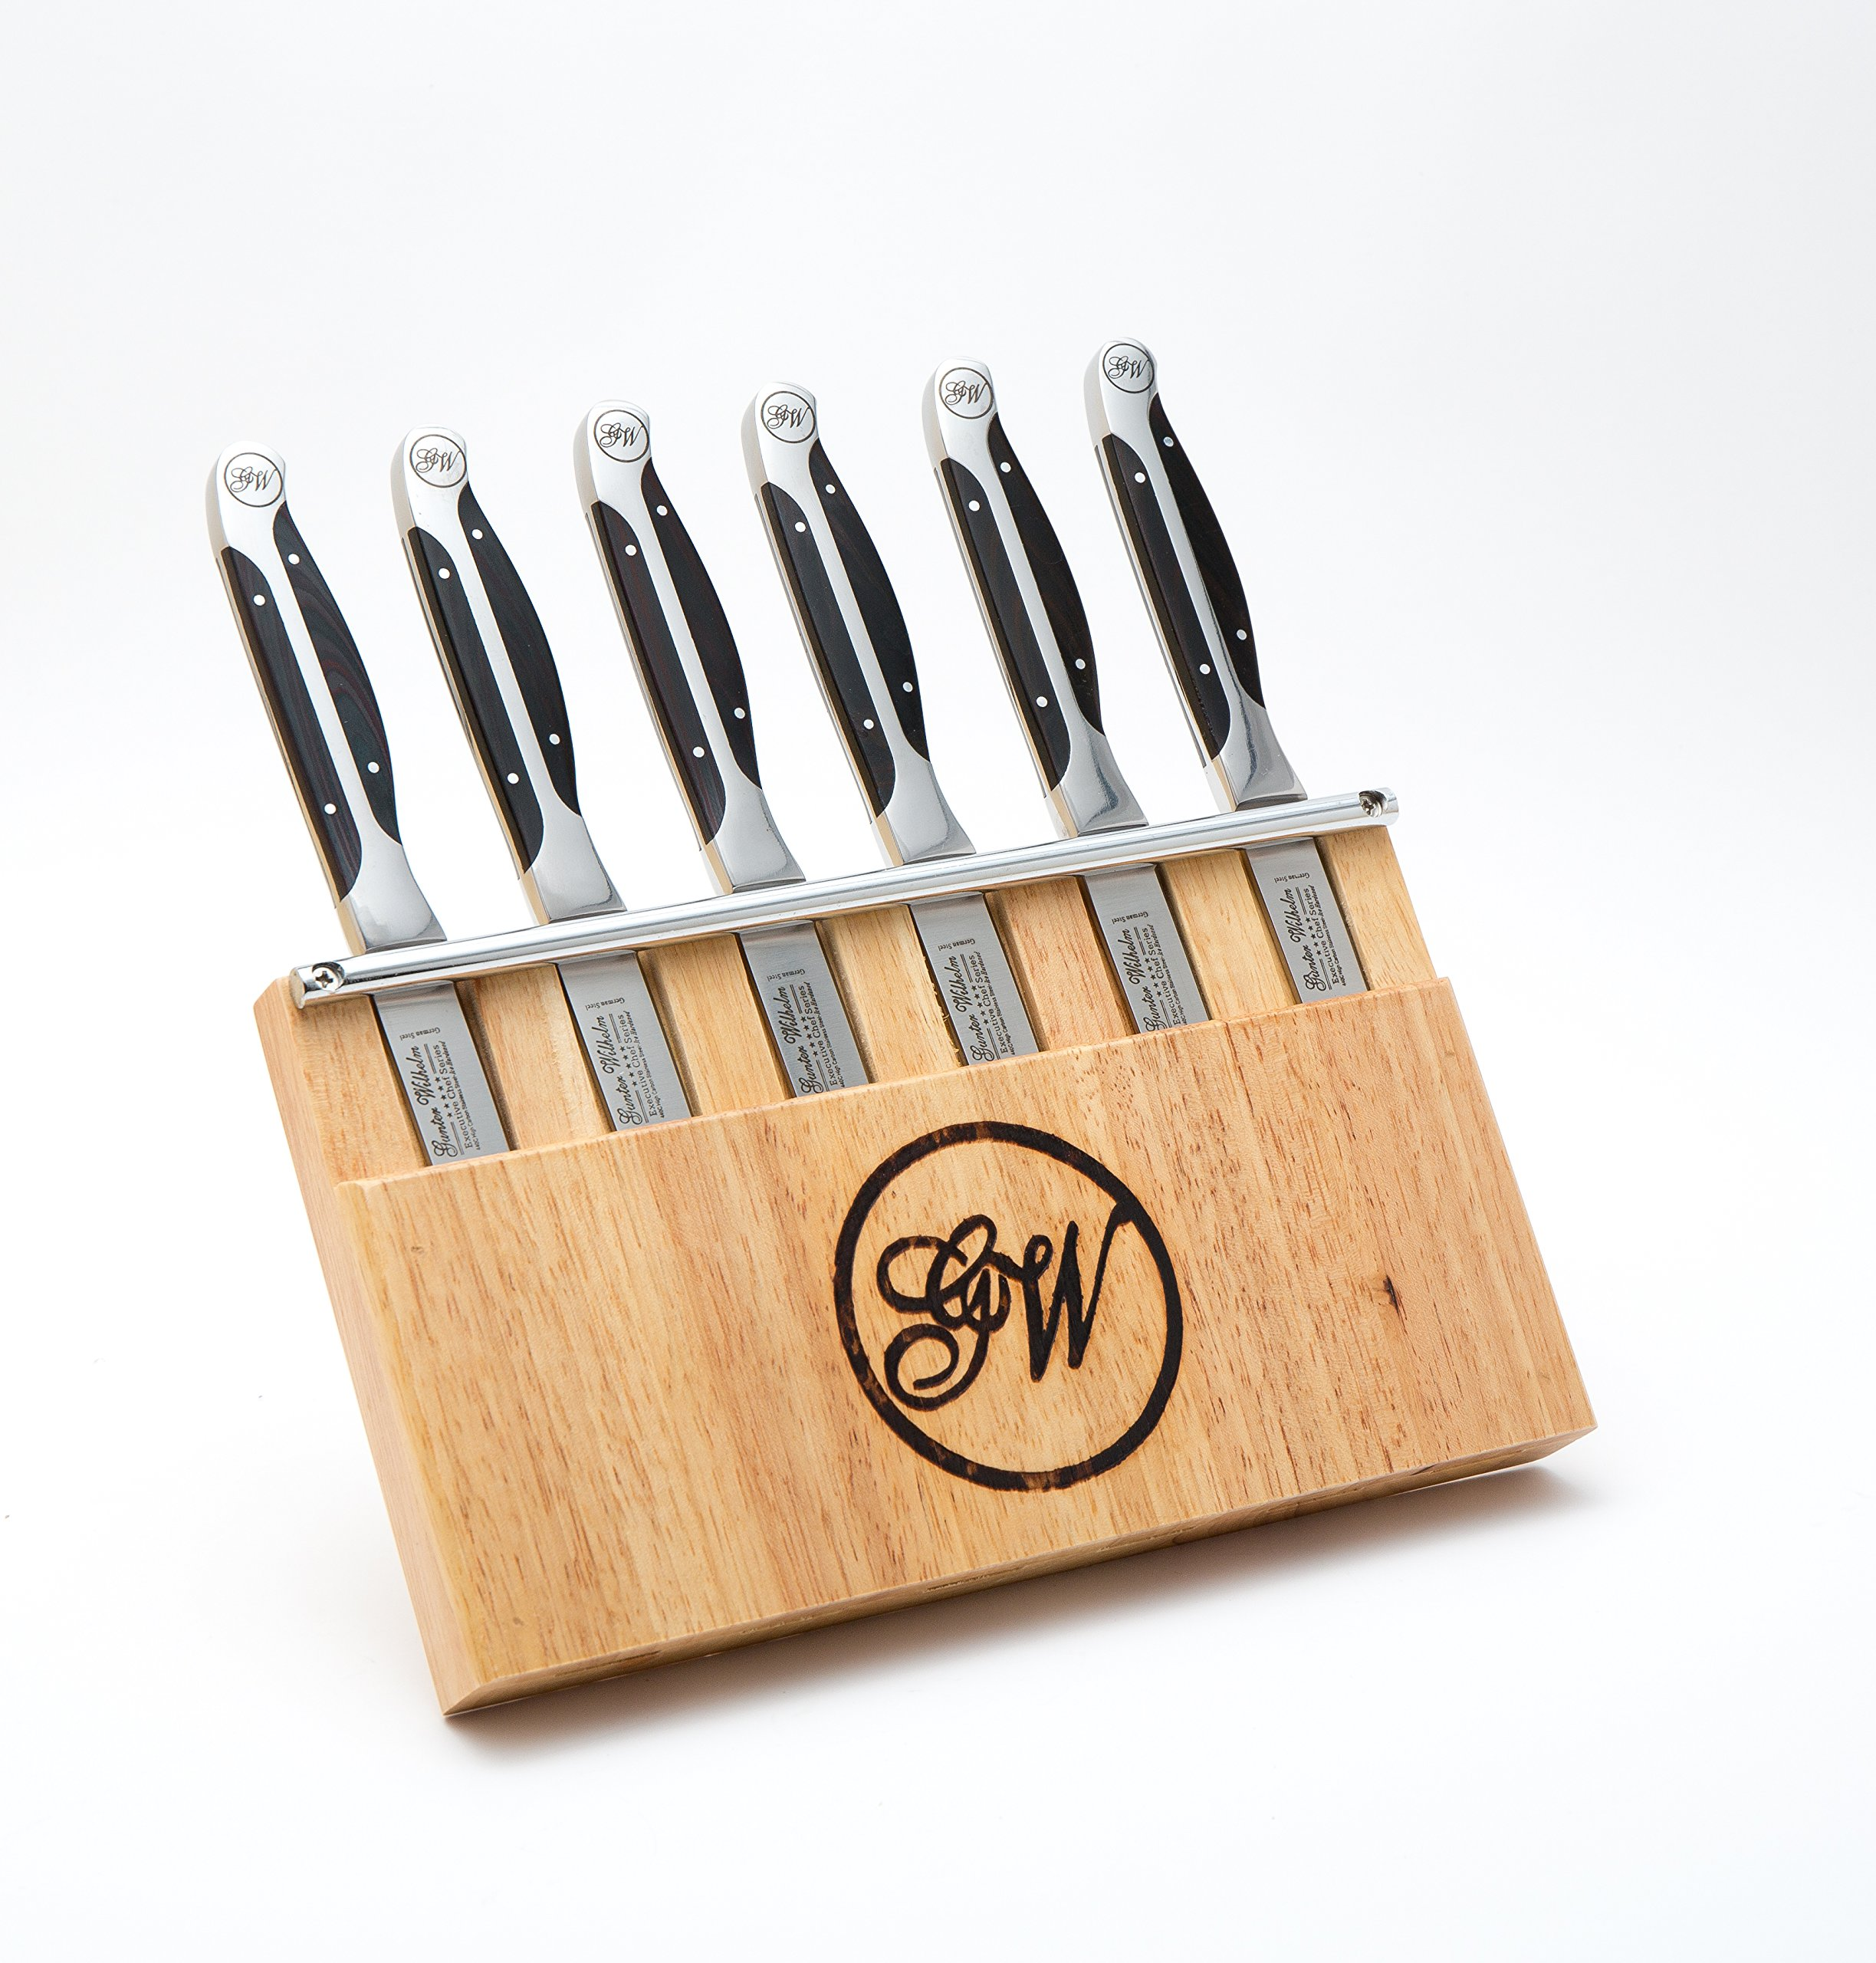 Gunter Wilhelm Cutlery 7pc Steak Knife Set - Black Pakkawood Handles